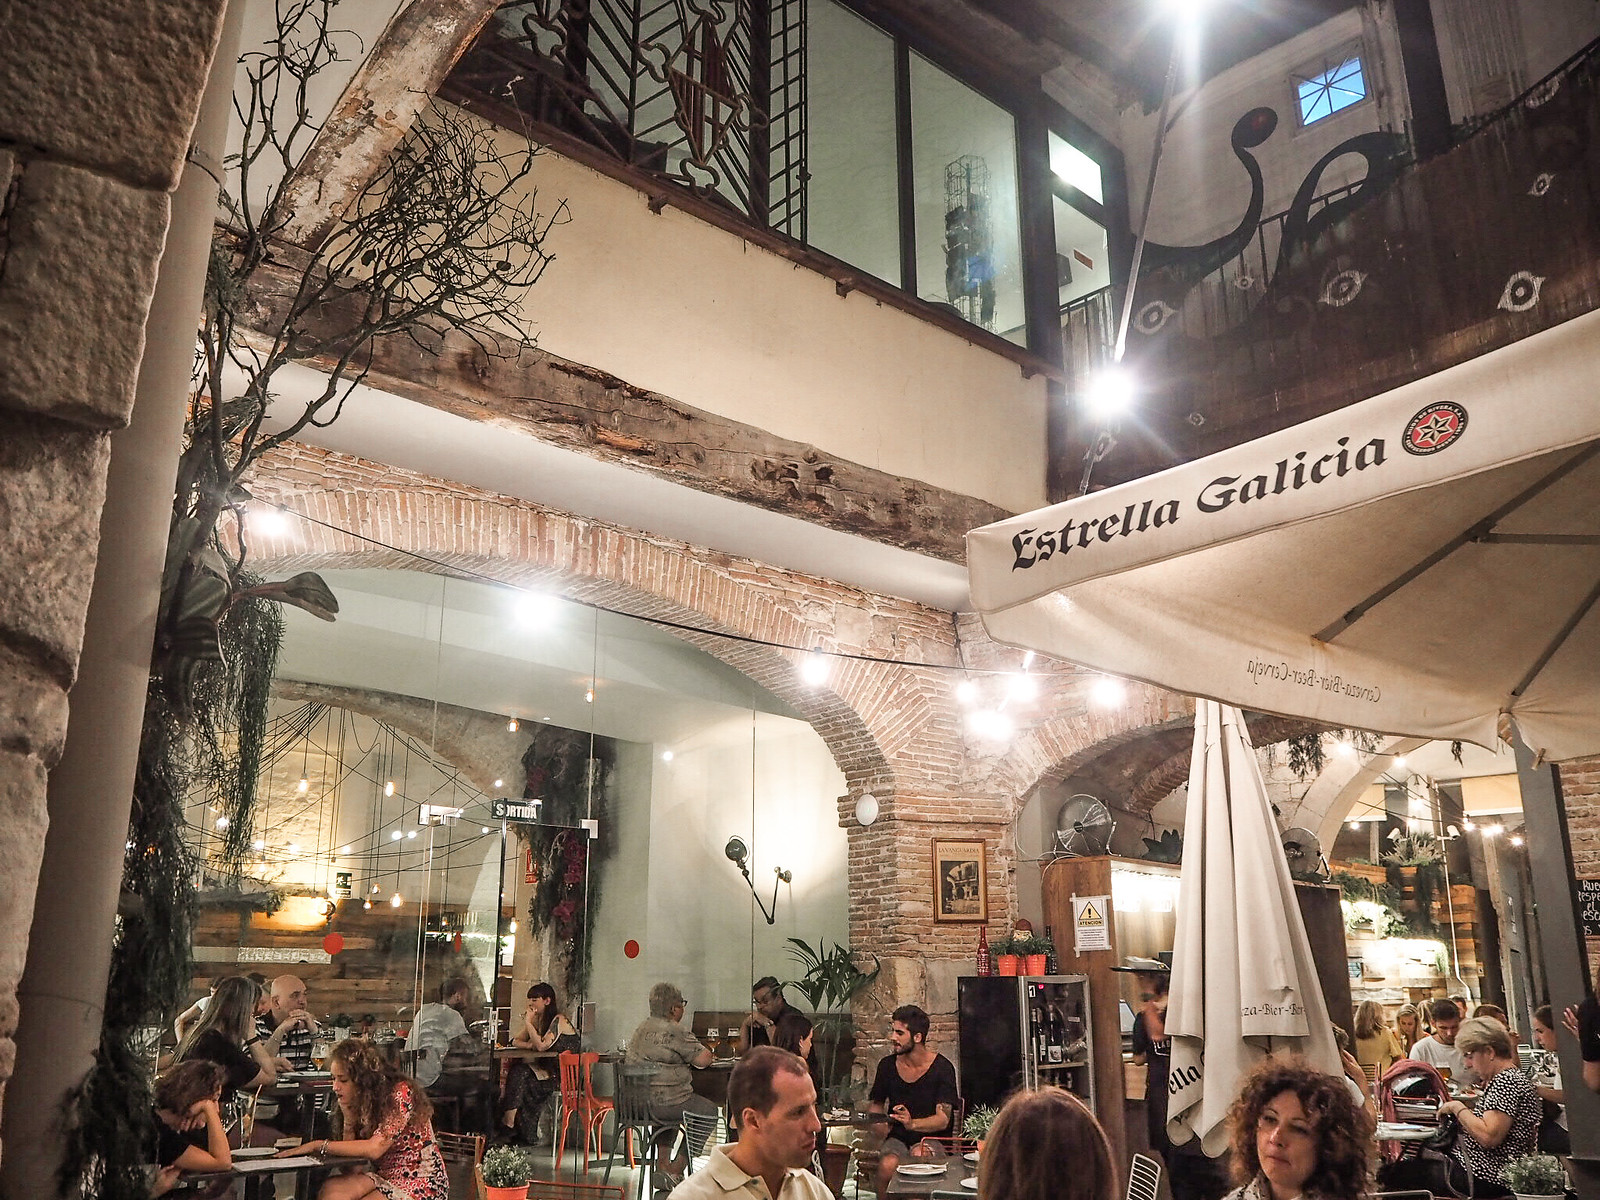 Parhaat ravintolat Barcelona